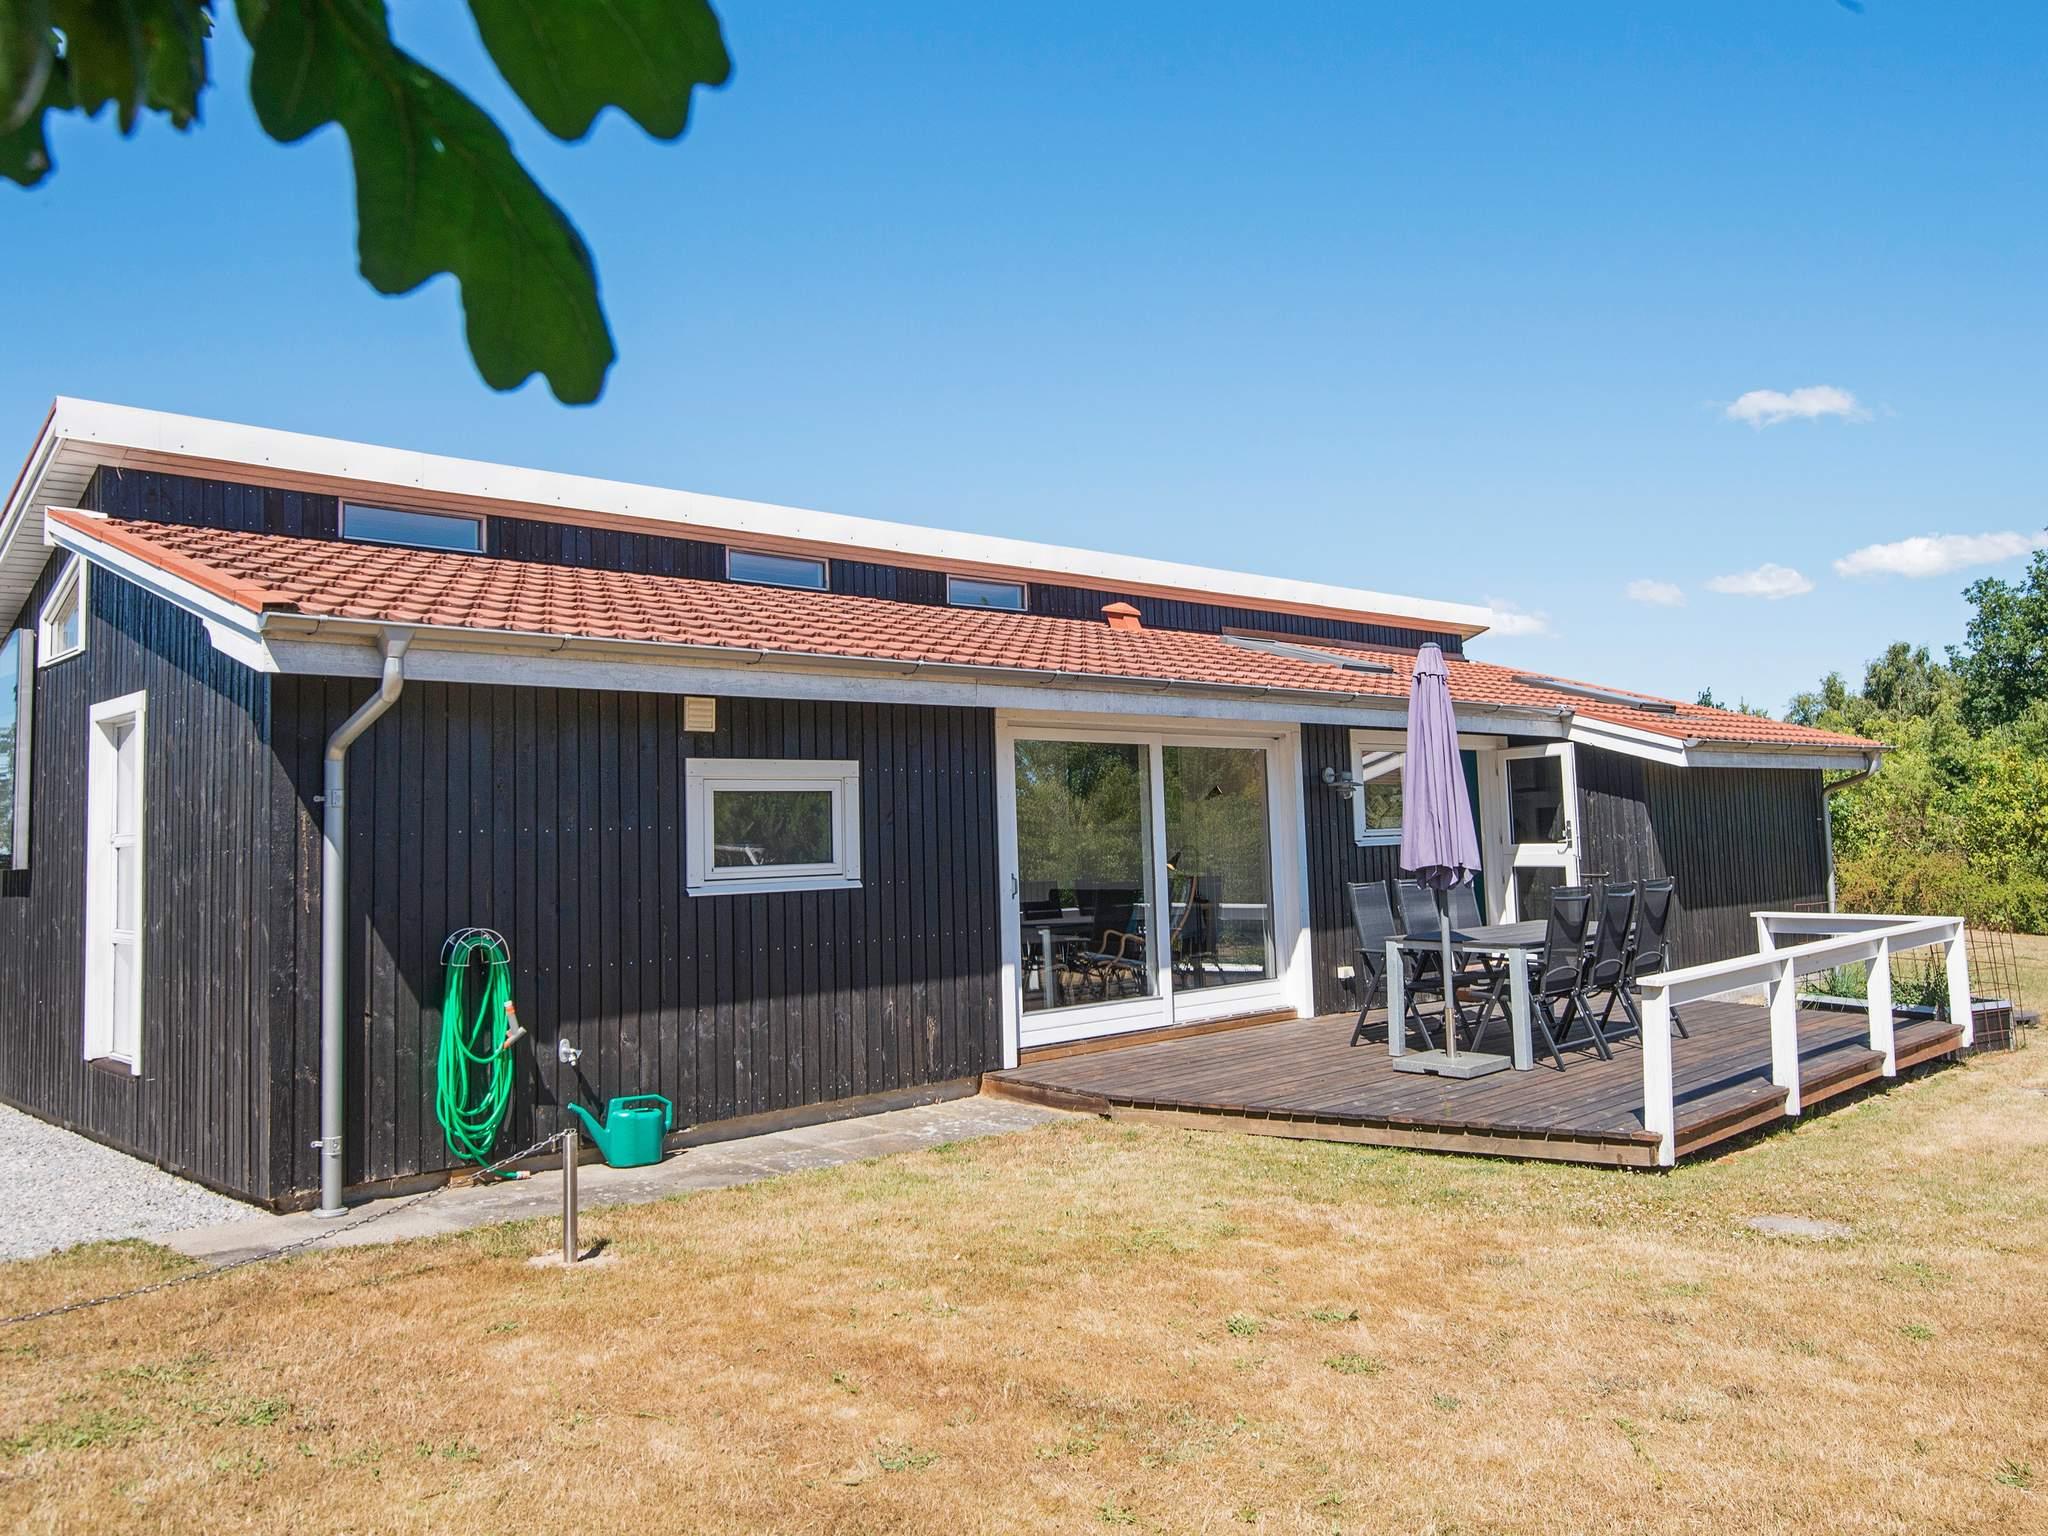 Maison de vacances Helgenæs (978615), Knebel, , Mer Baltique danoise, Danemark, image 1